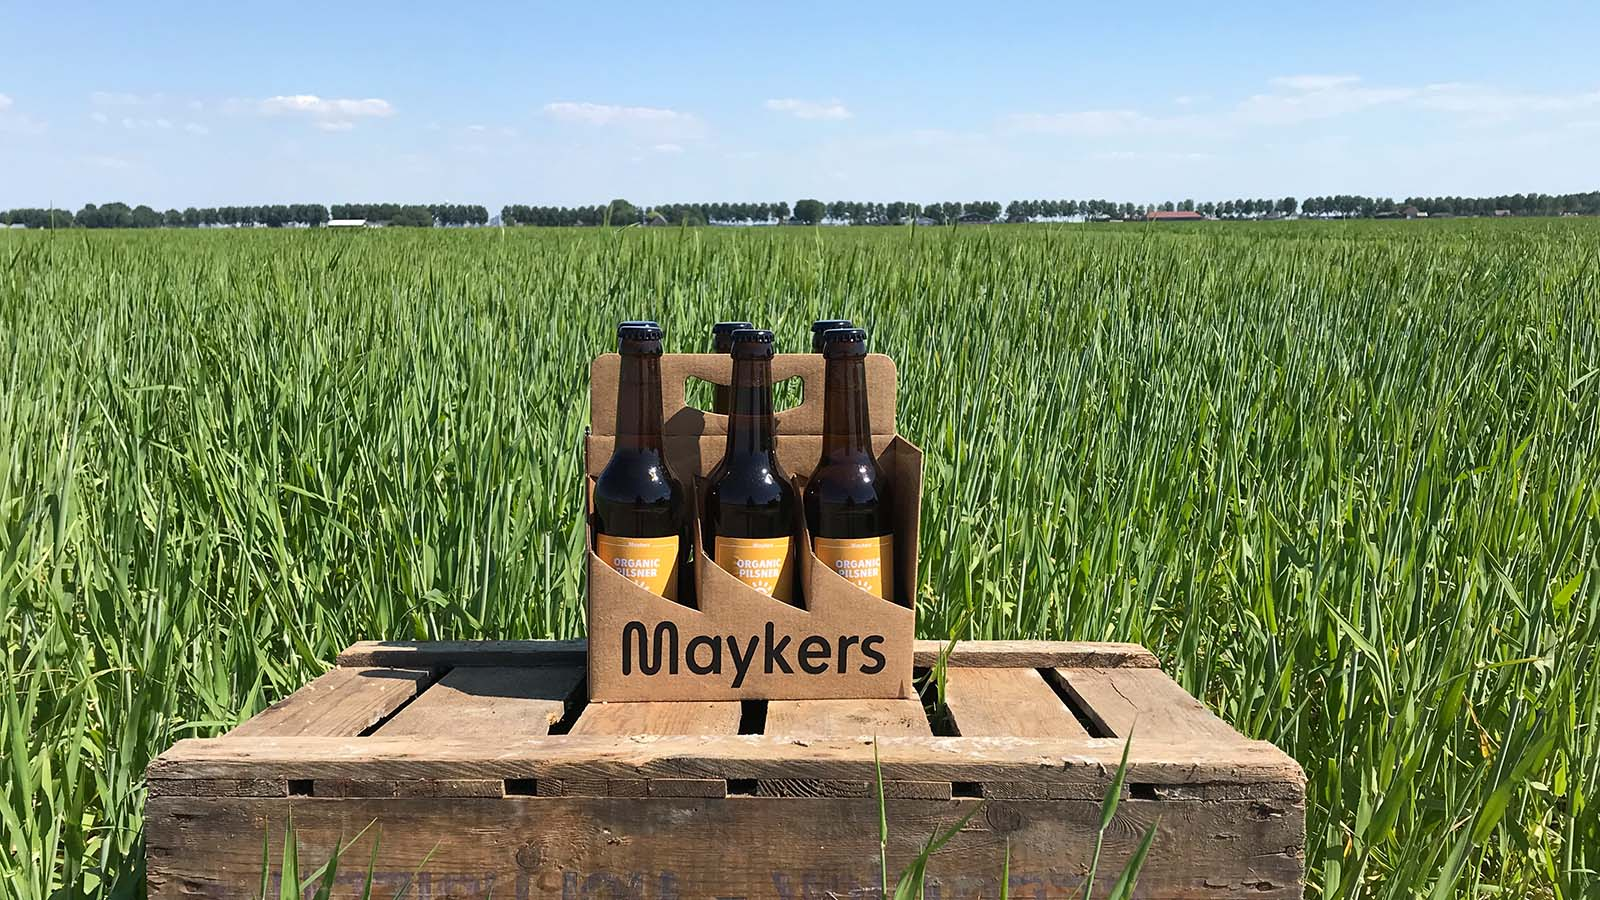 Maykers